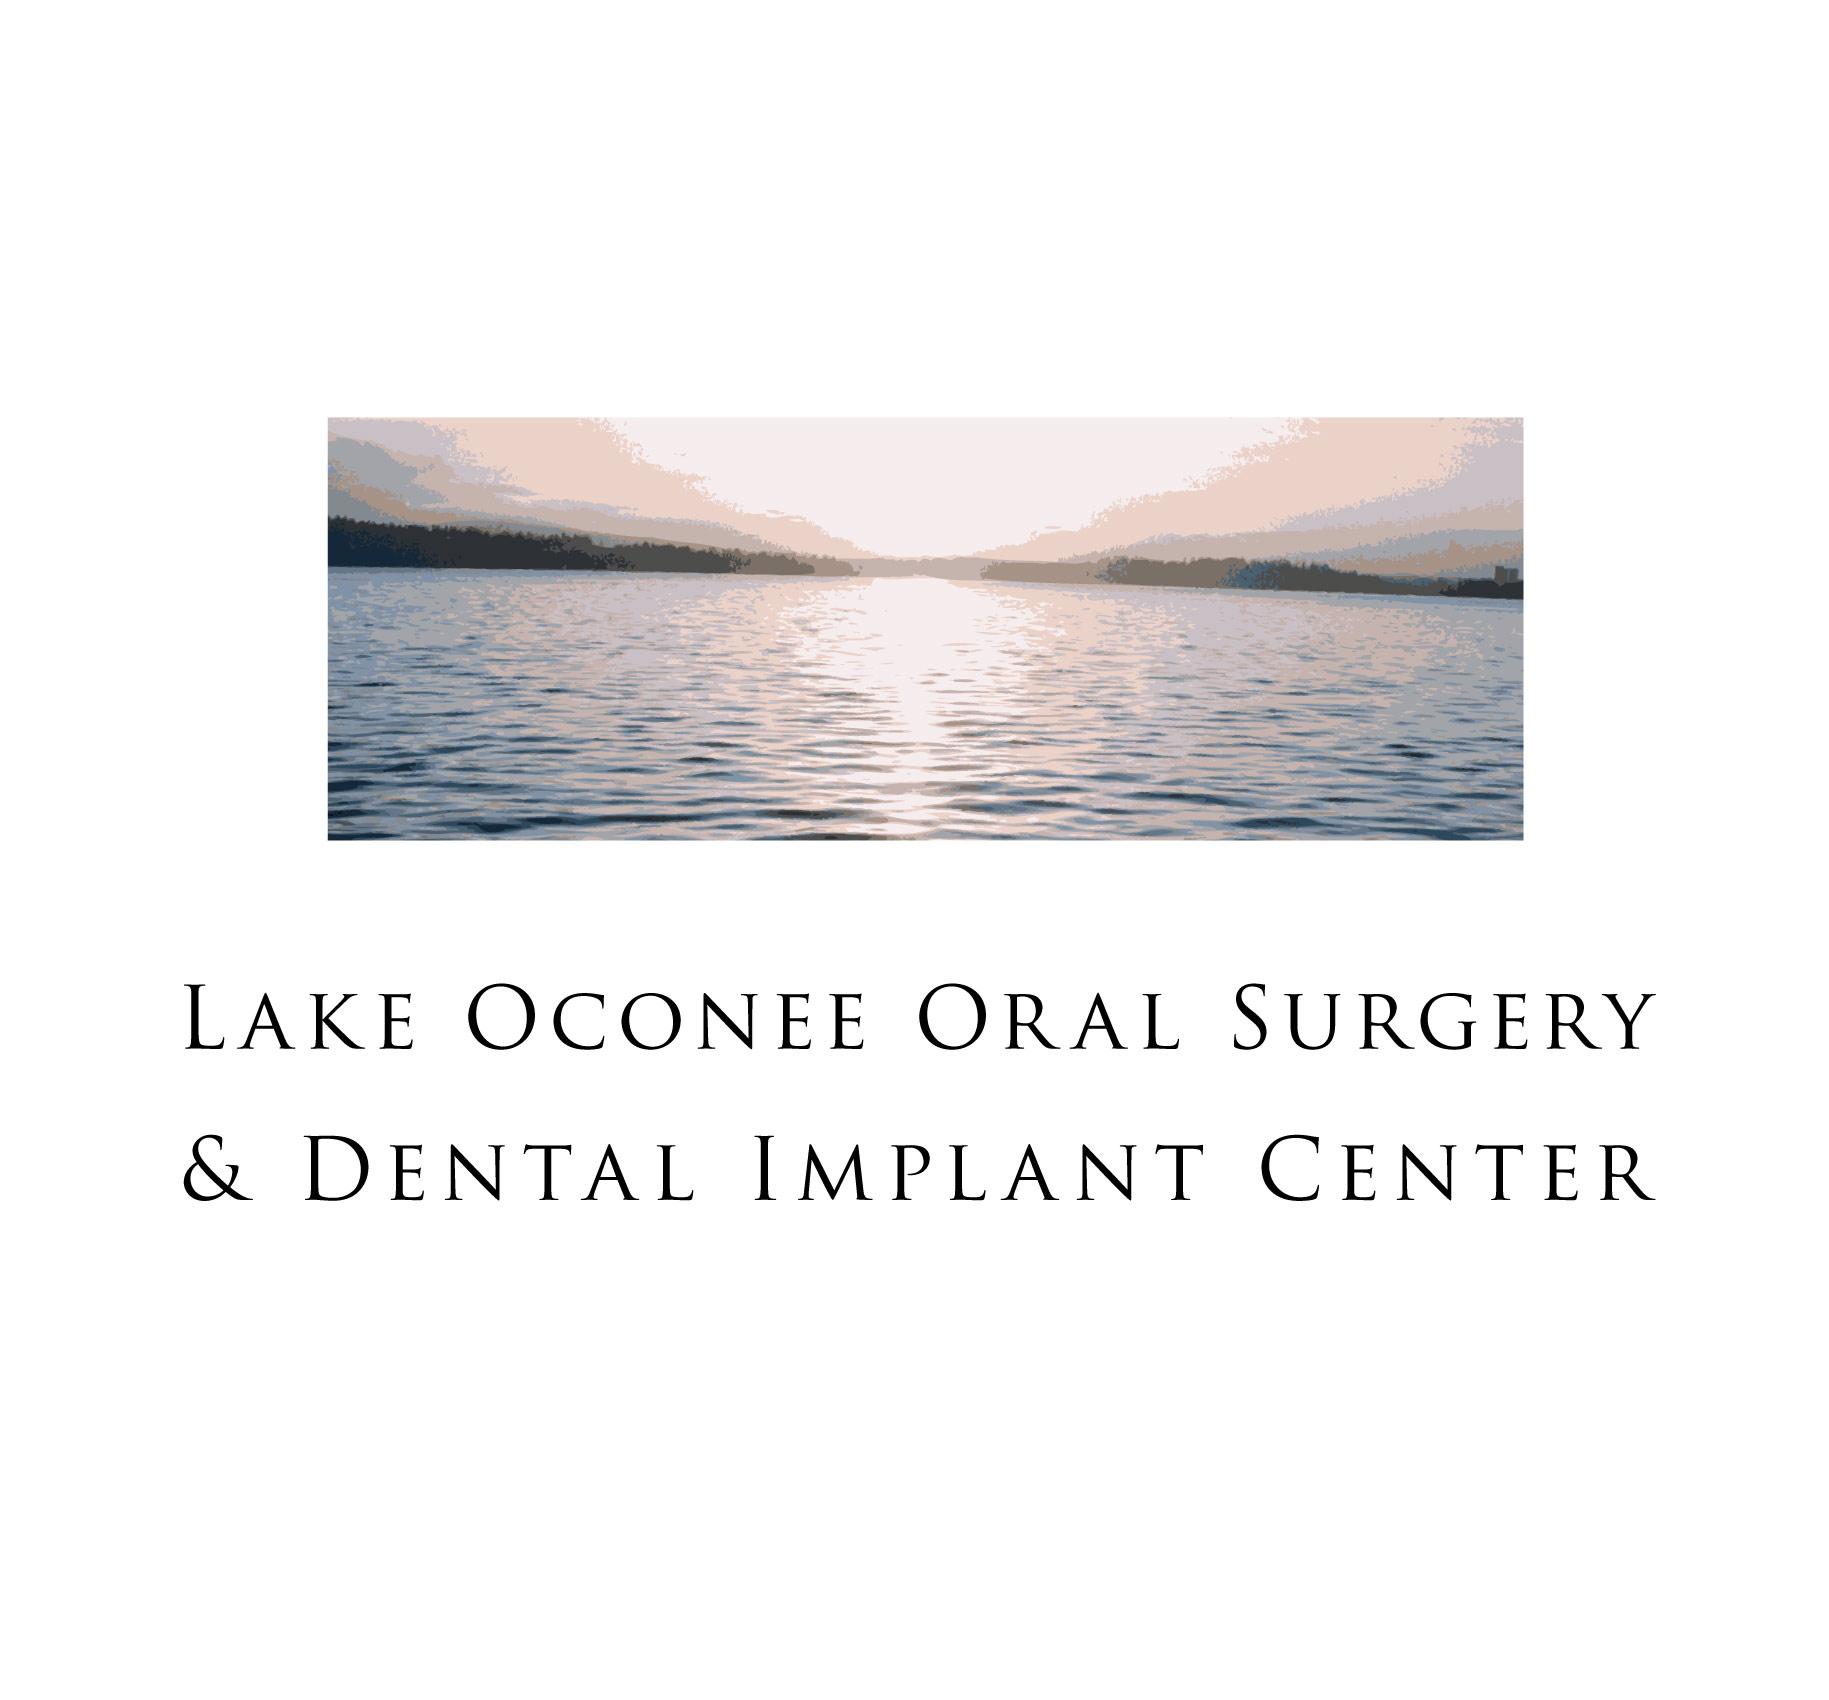 LO-Oral-Surgery-&-Dental-Implant-Center-logo-1.jpg